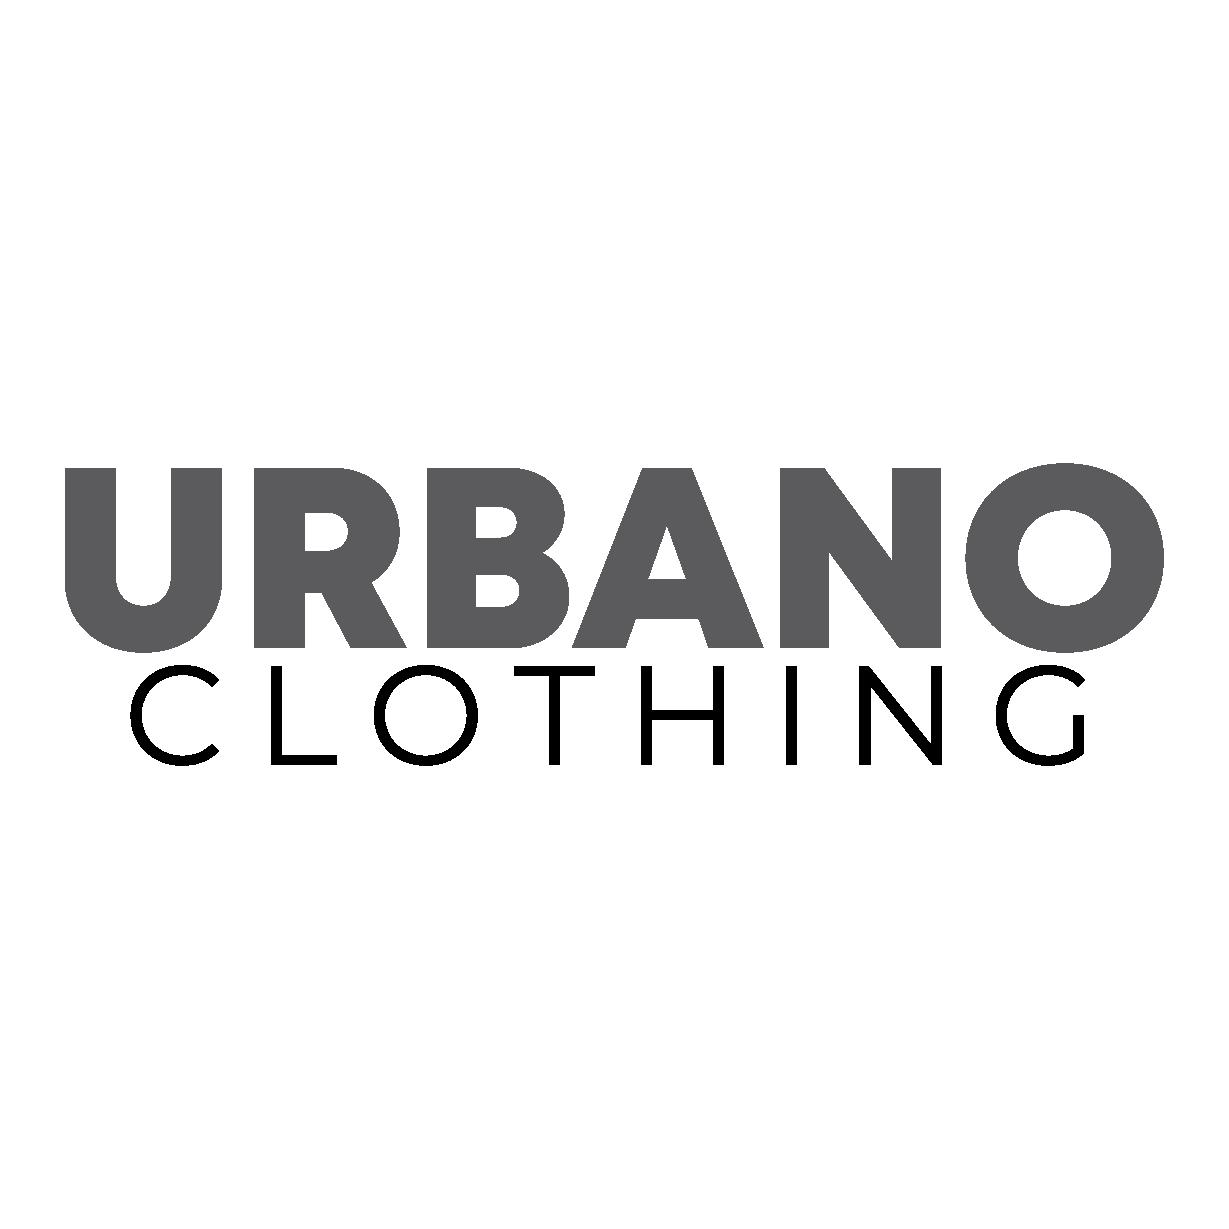 Urbano Clothing